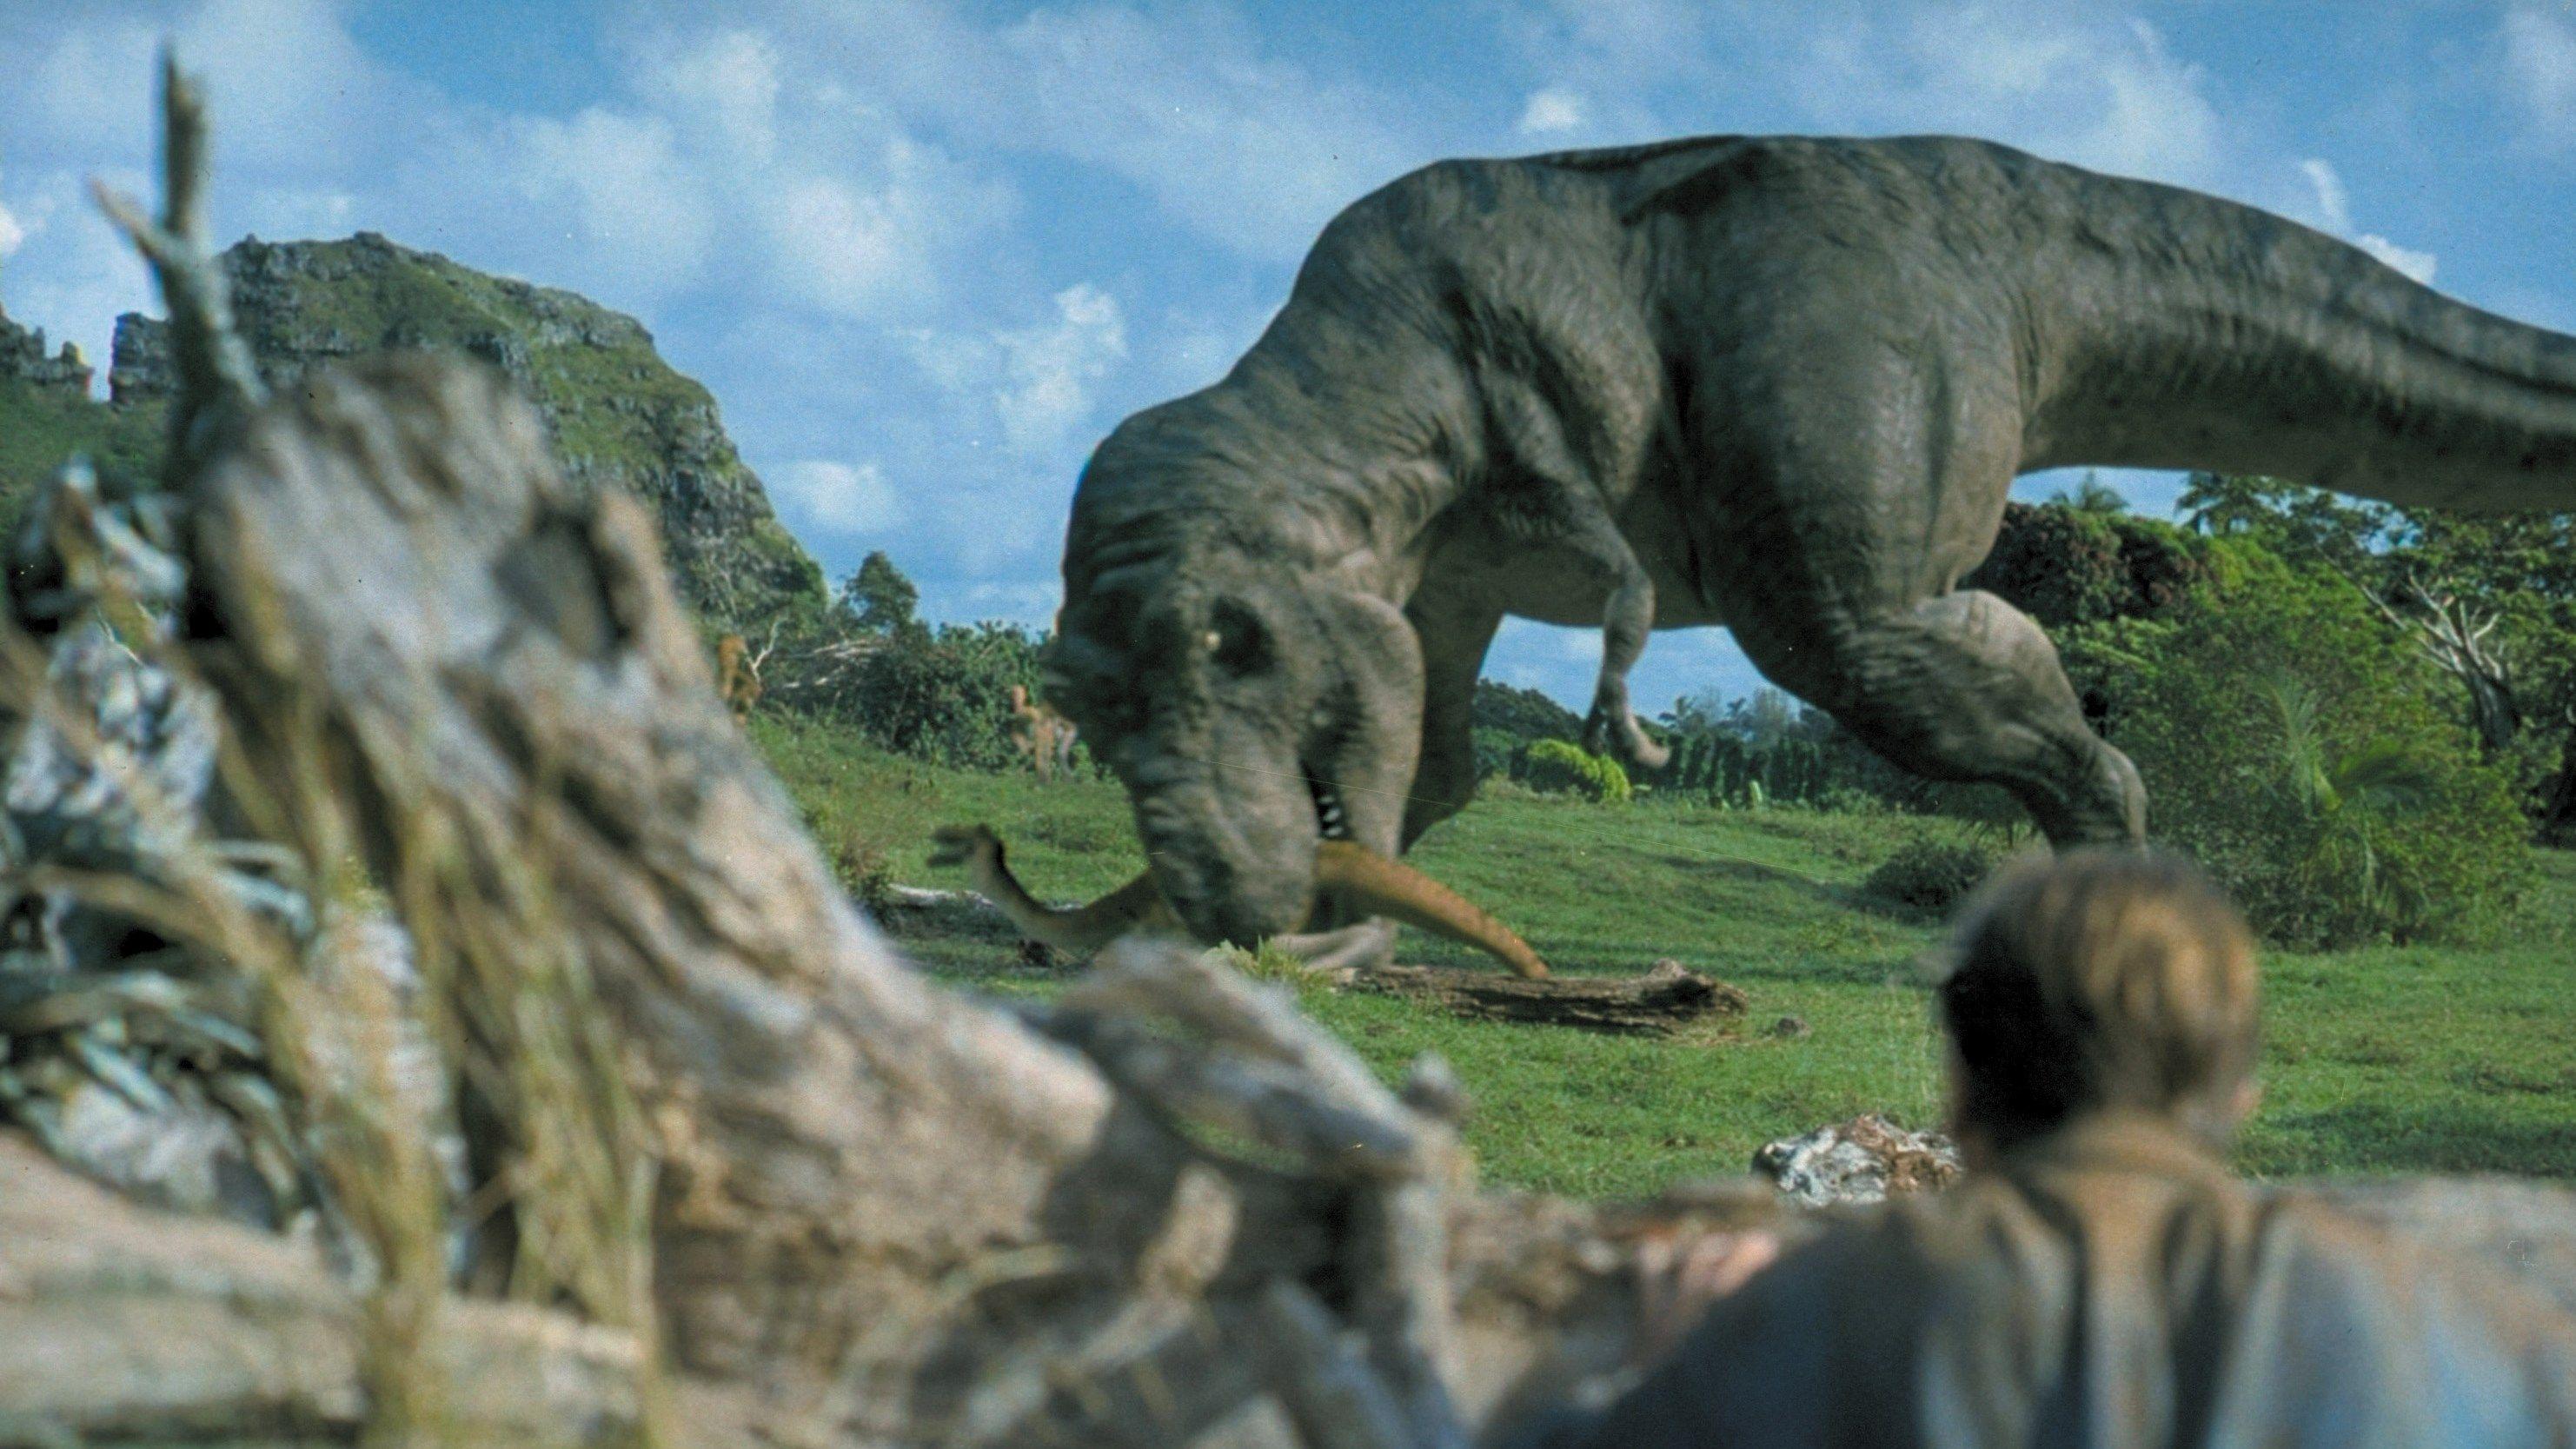 free screensaver wallpapers for jurassic park Jurassic